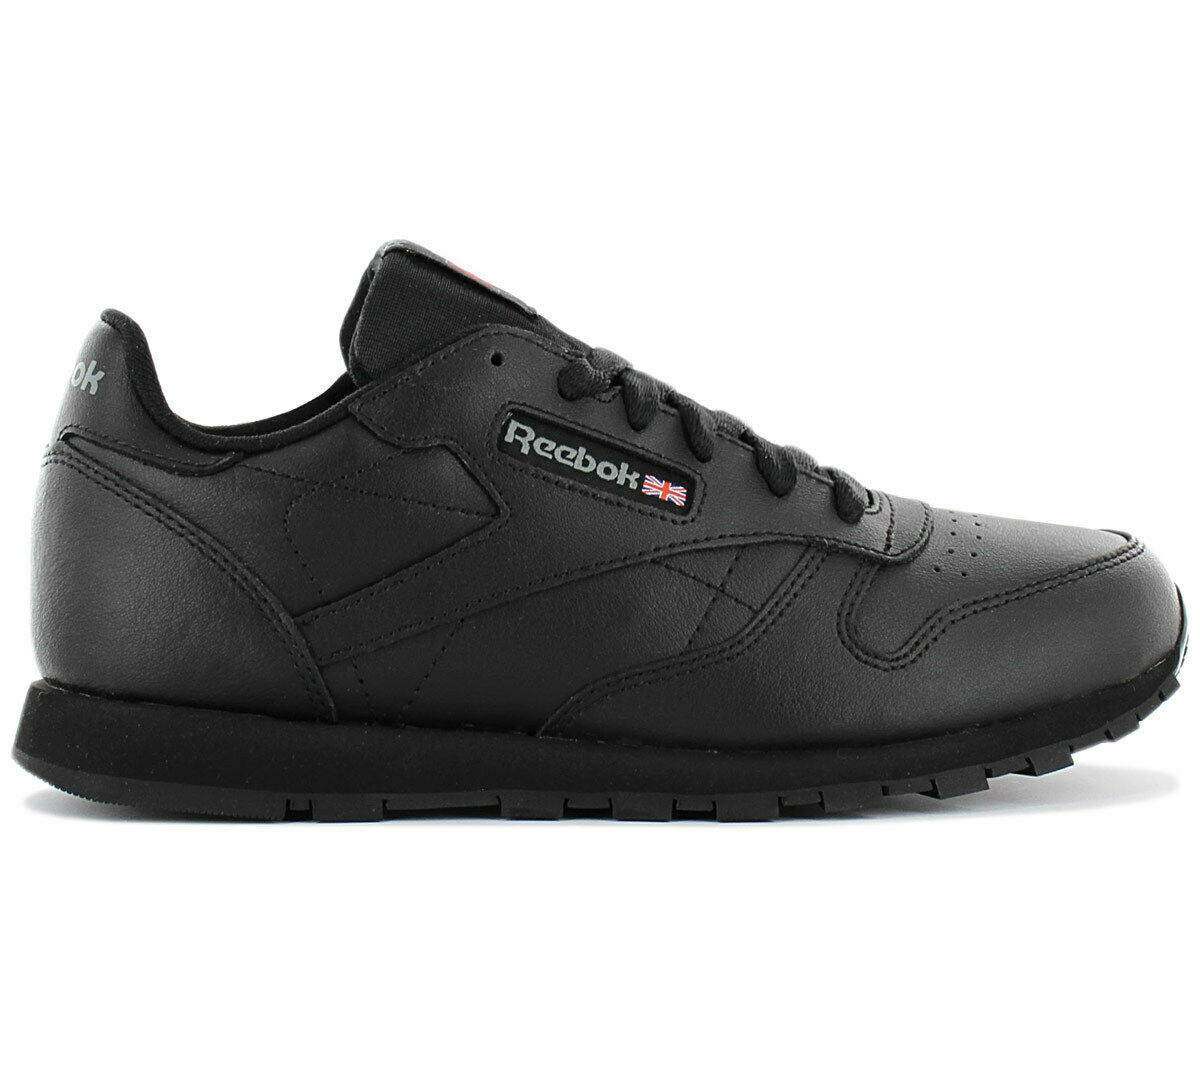 Reebok classic Leather CL Lthr 3912